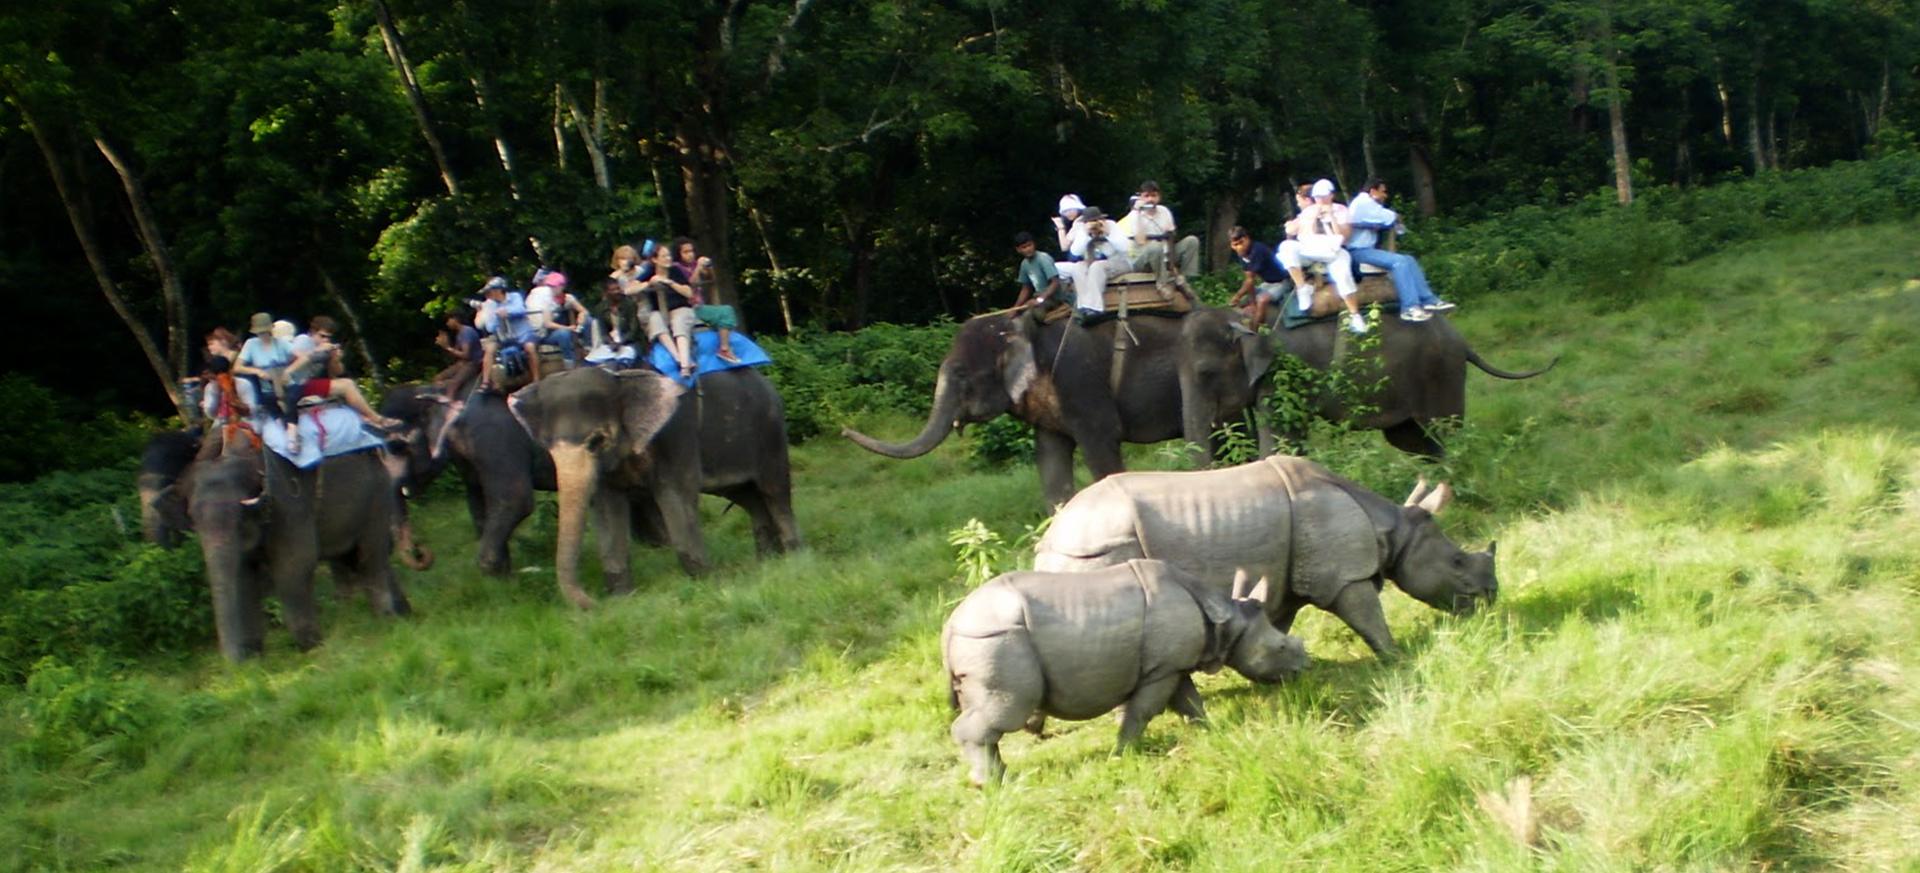 Kathmandu-Pokhara-Chitwan-Jungle-Safari-Tour.